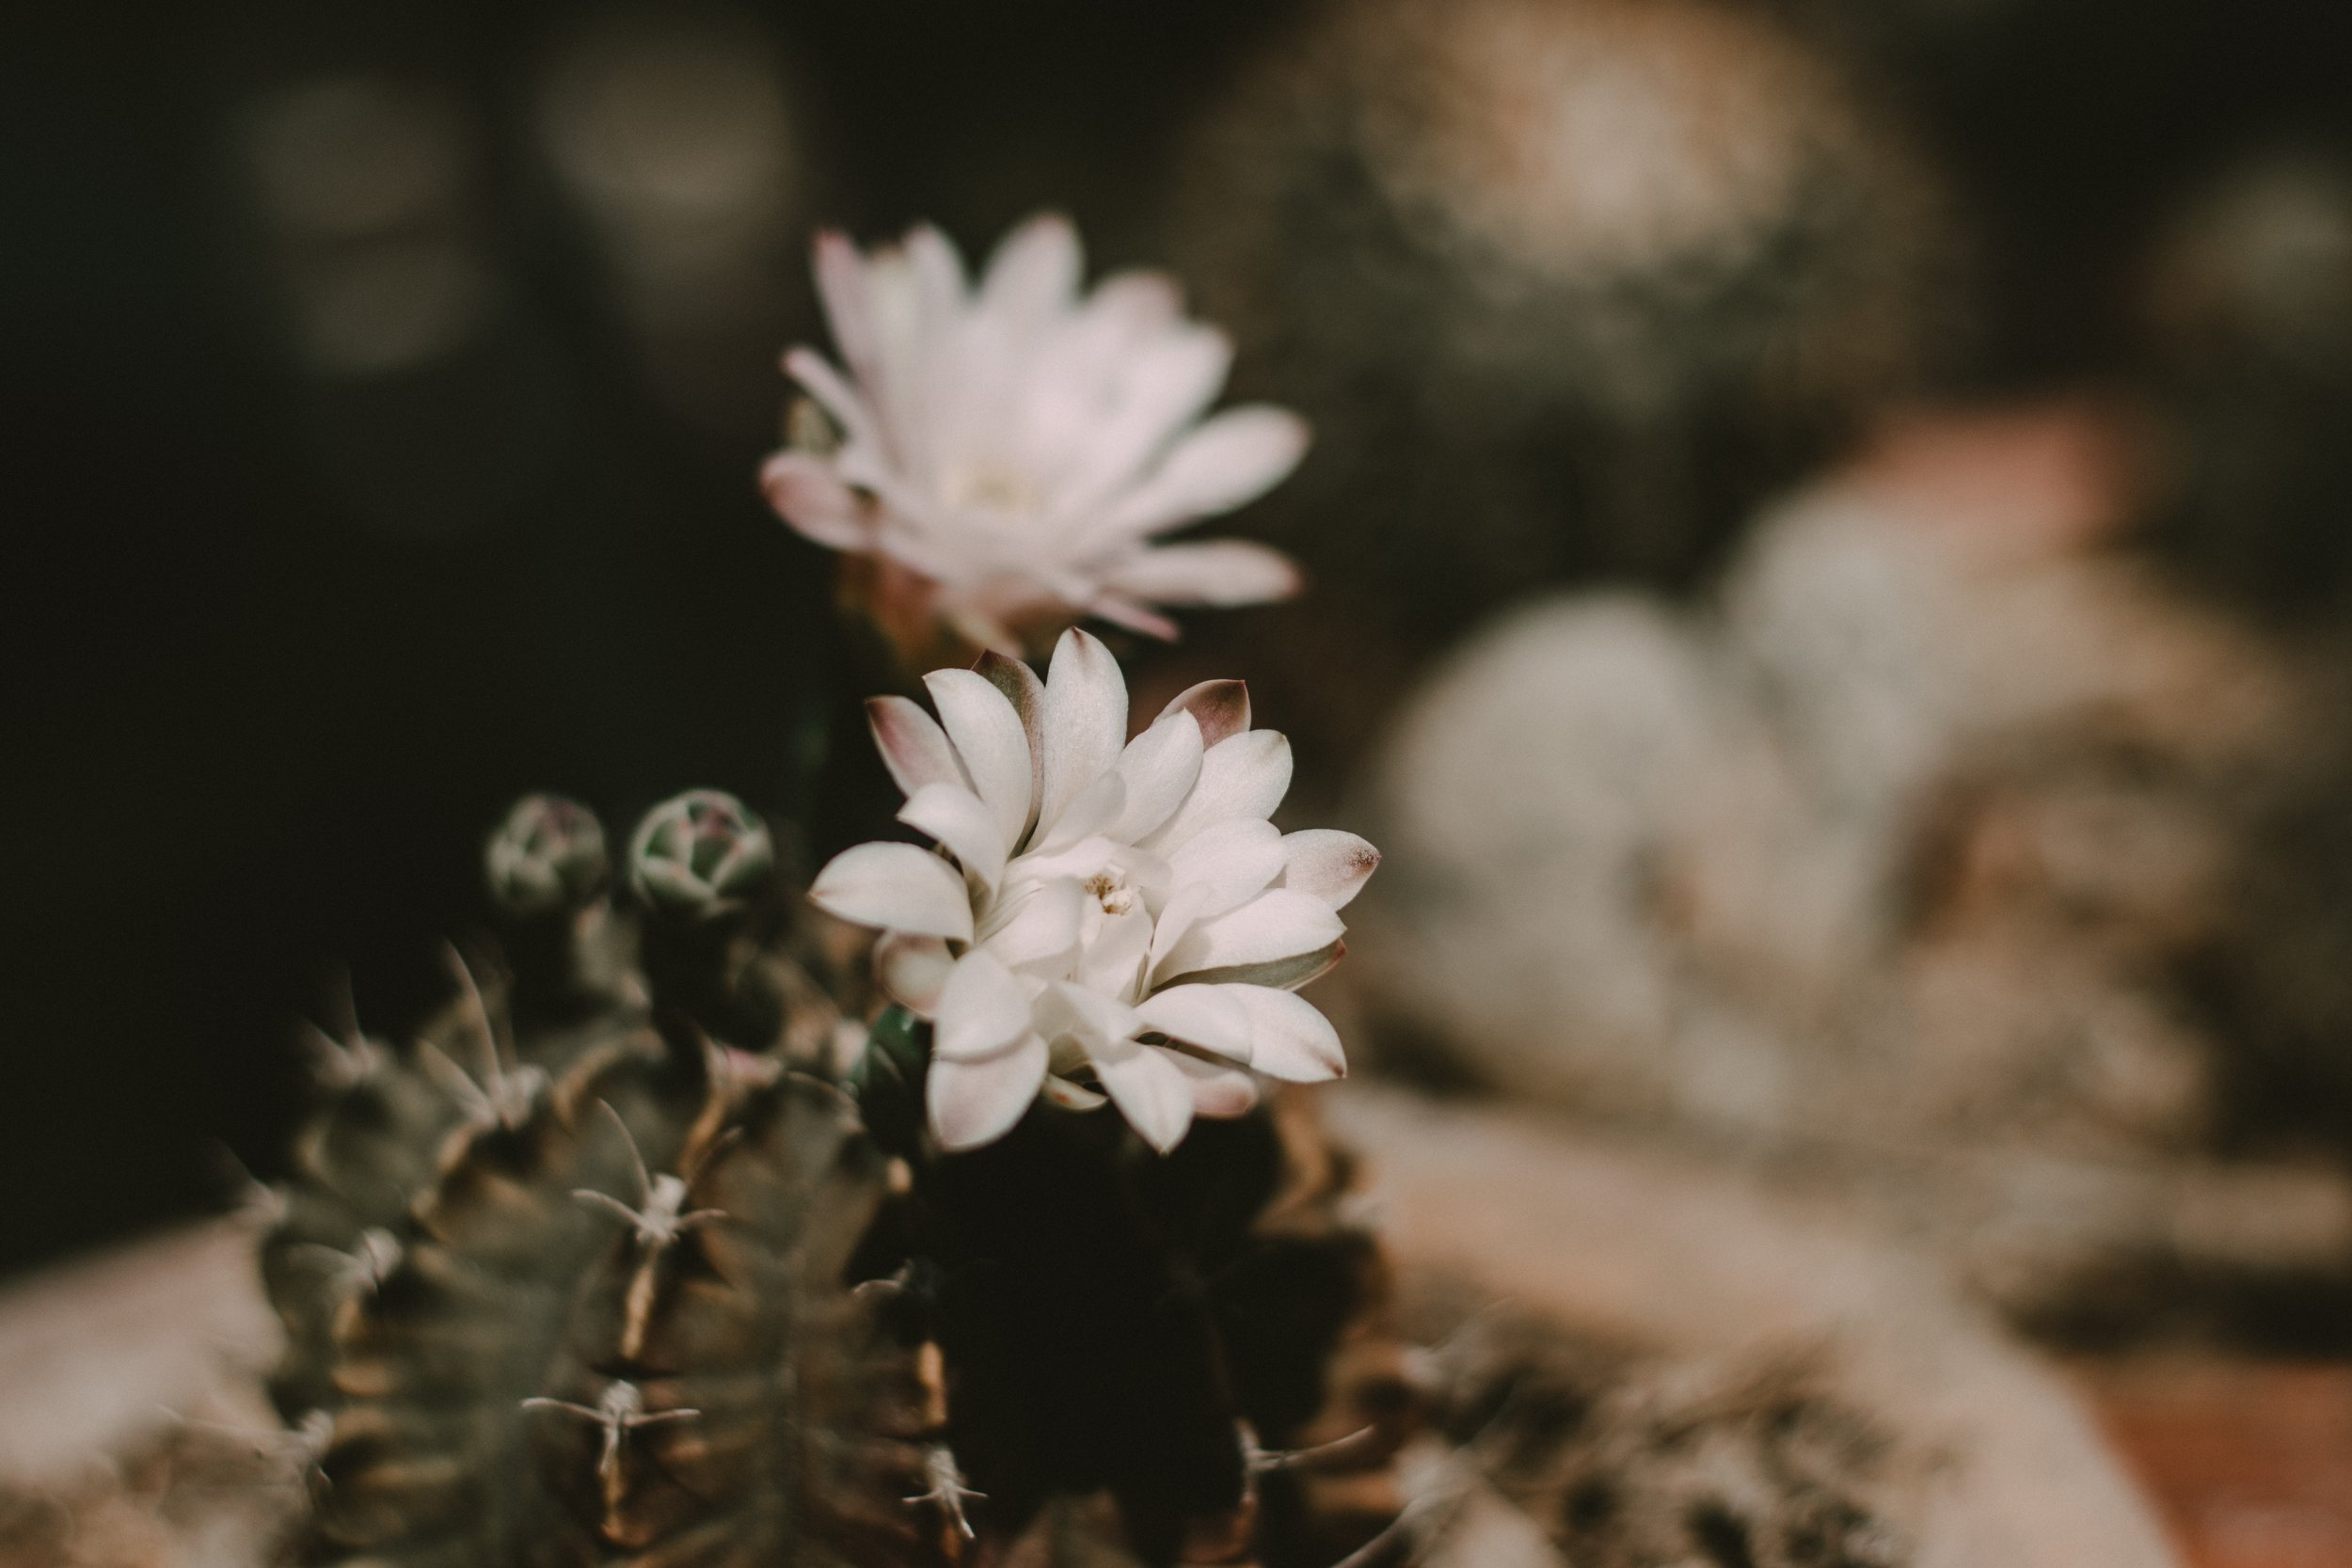 beautiful-beautiful-flowers-blooming-1242558.jpg